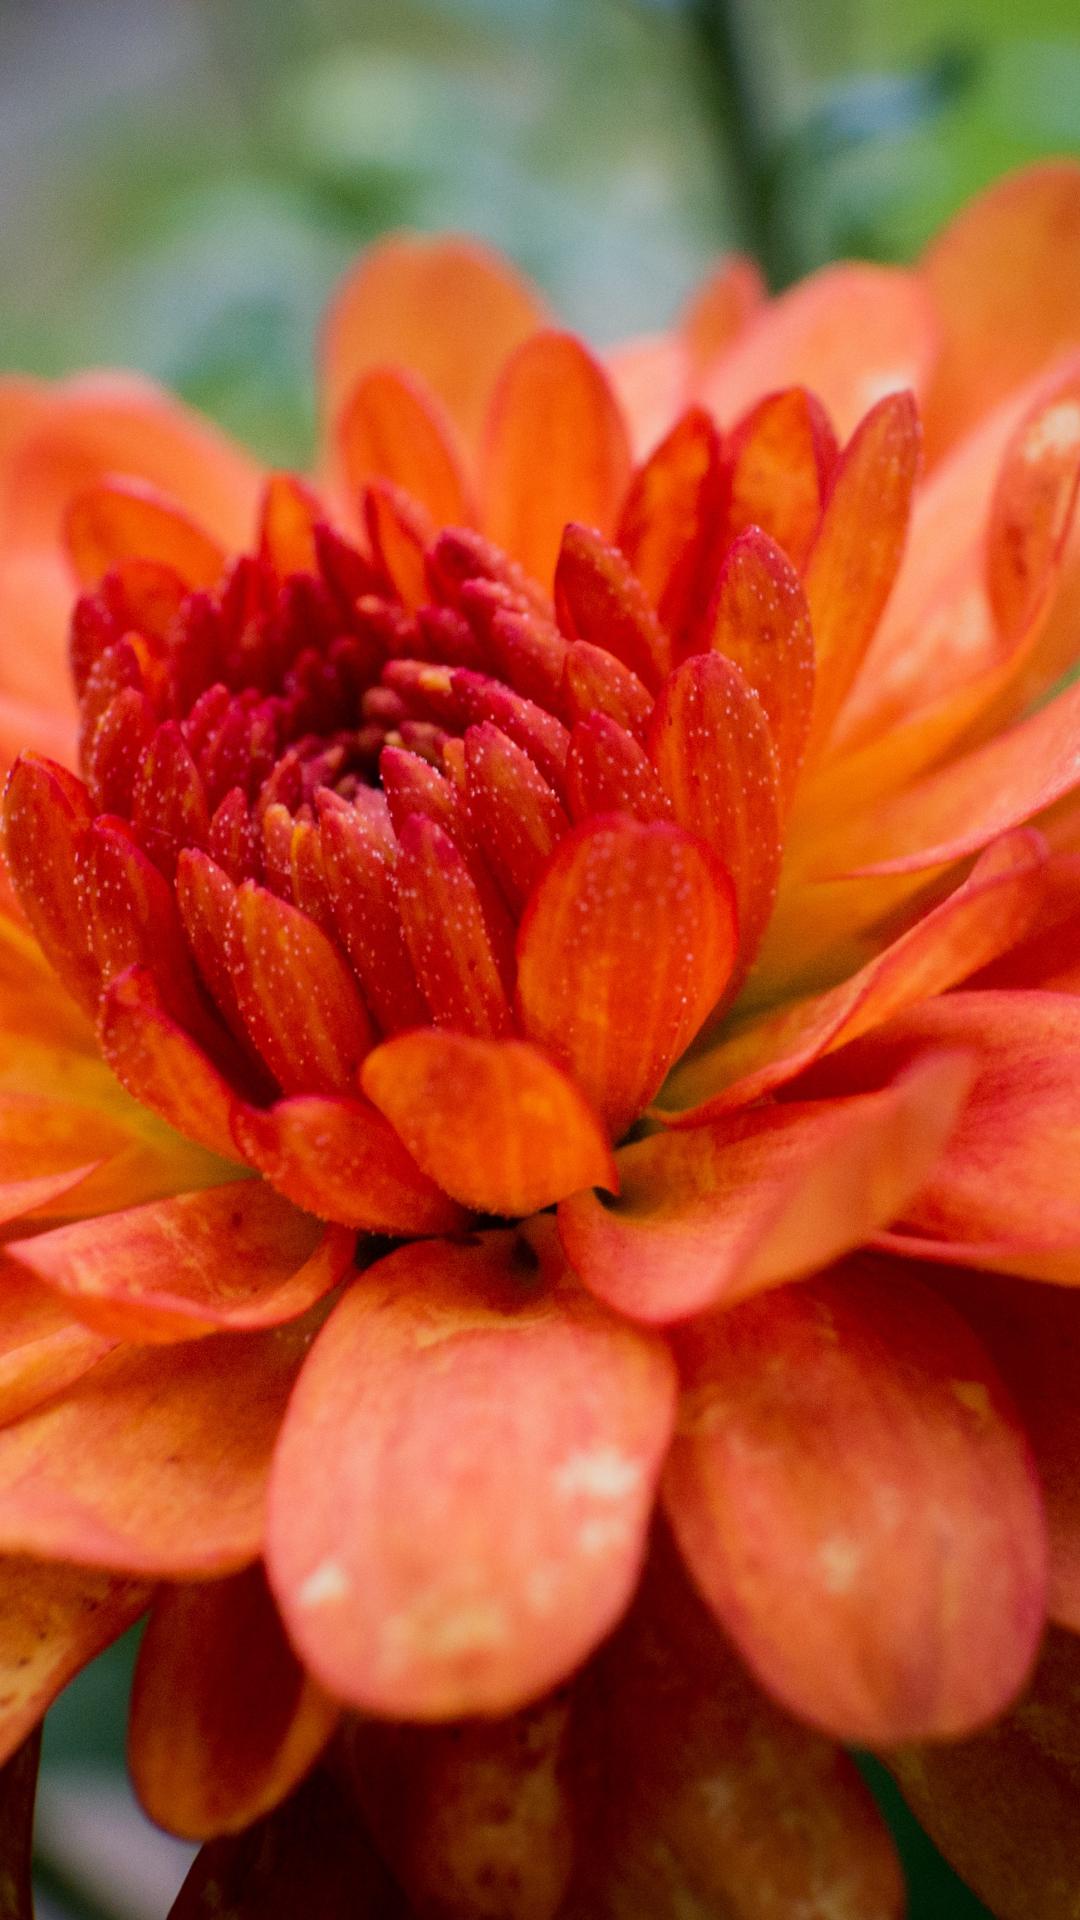 Macro Floral Iphone Wallpaper Idrop News